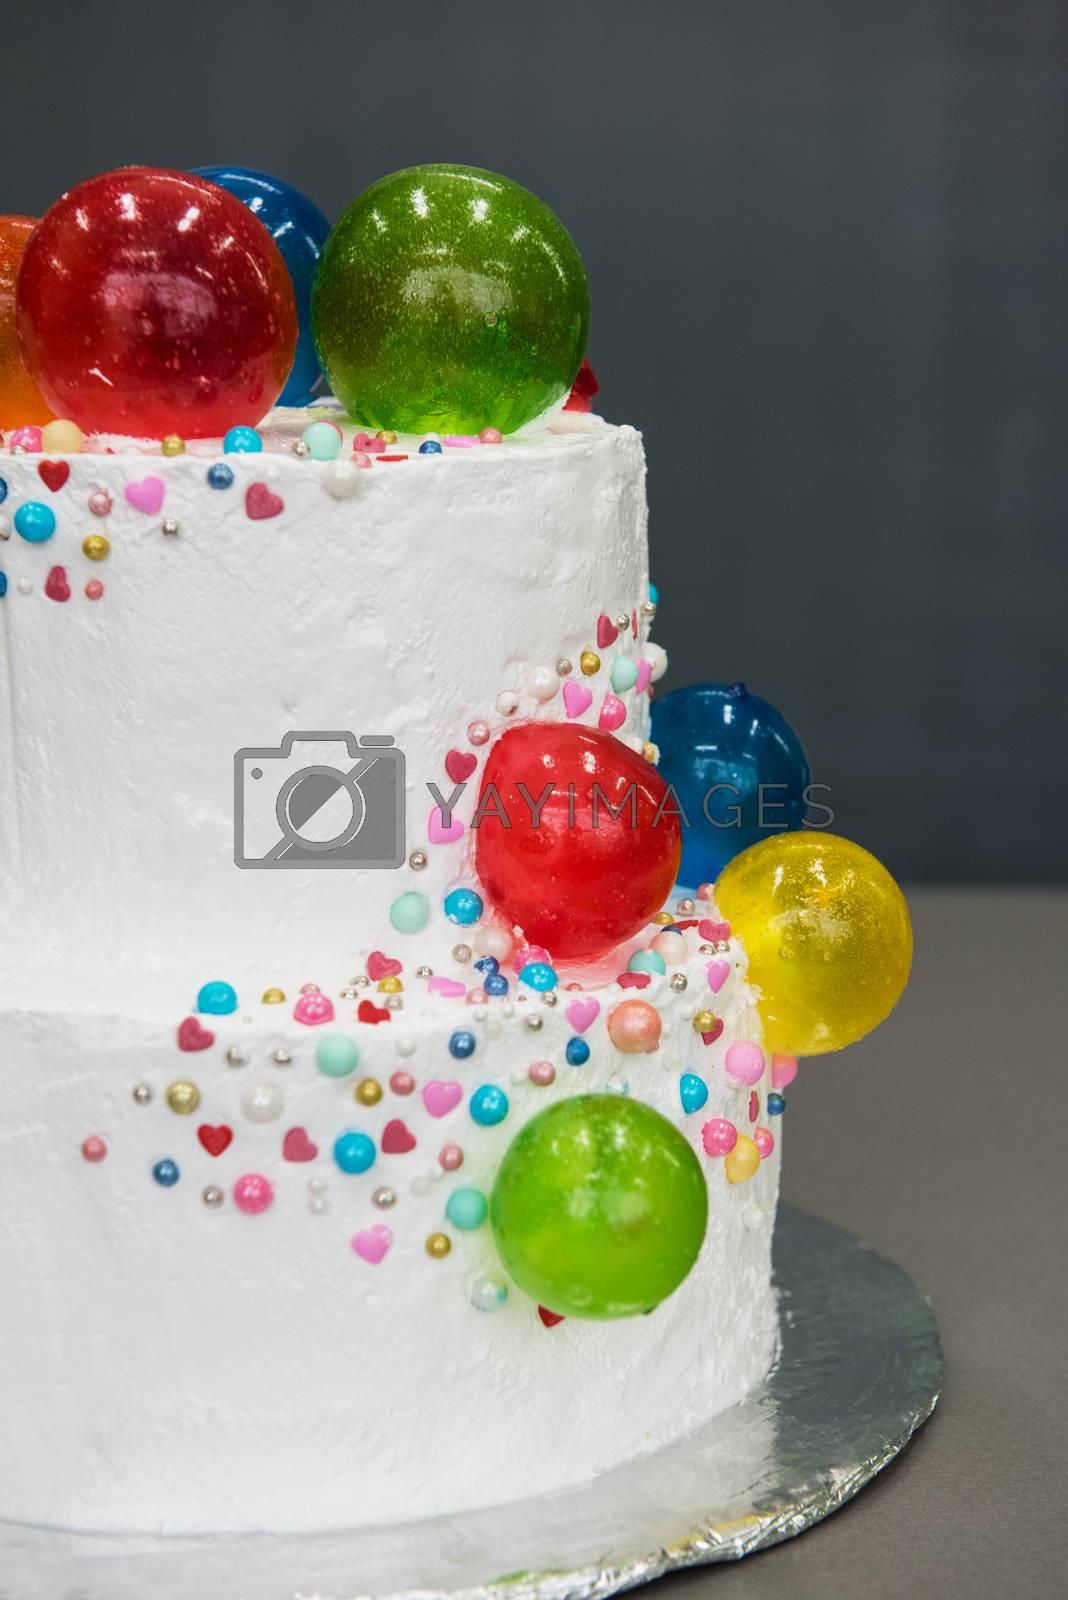 Wedding cake on table by rusak